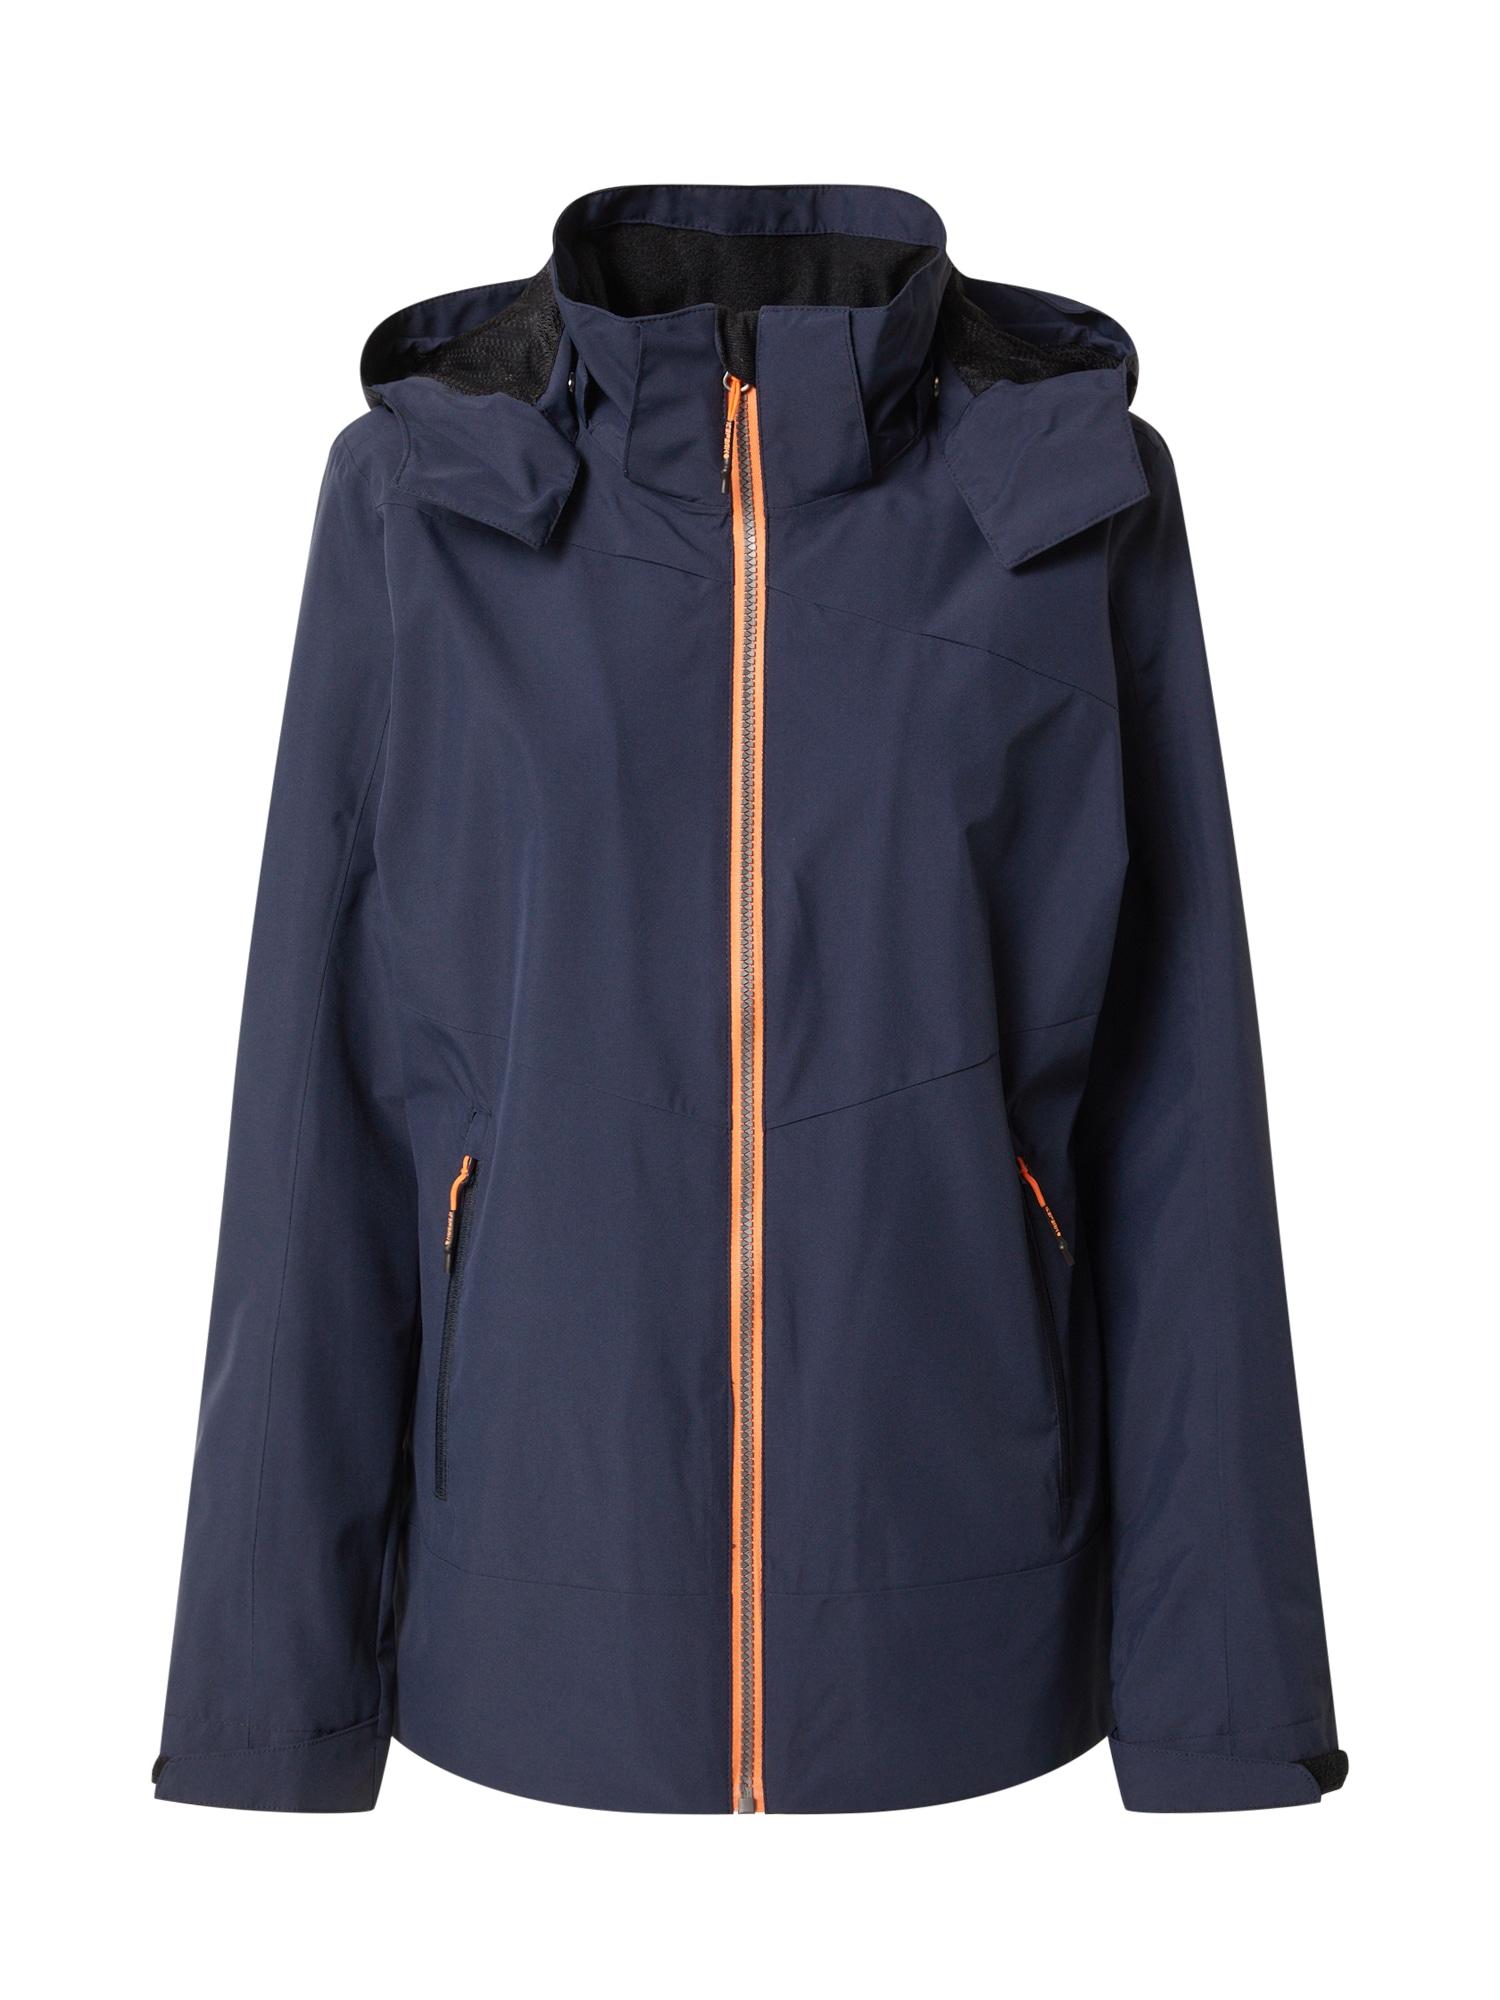 ICEPEAK Outdoorová bunda 'Calera'  tmavě modrá